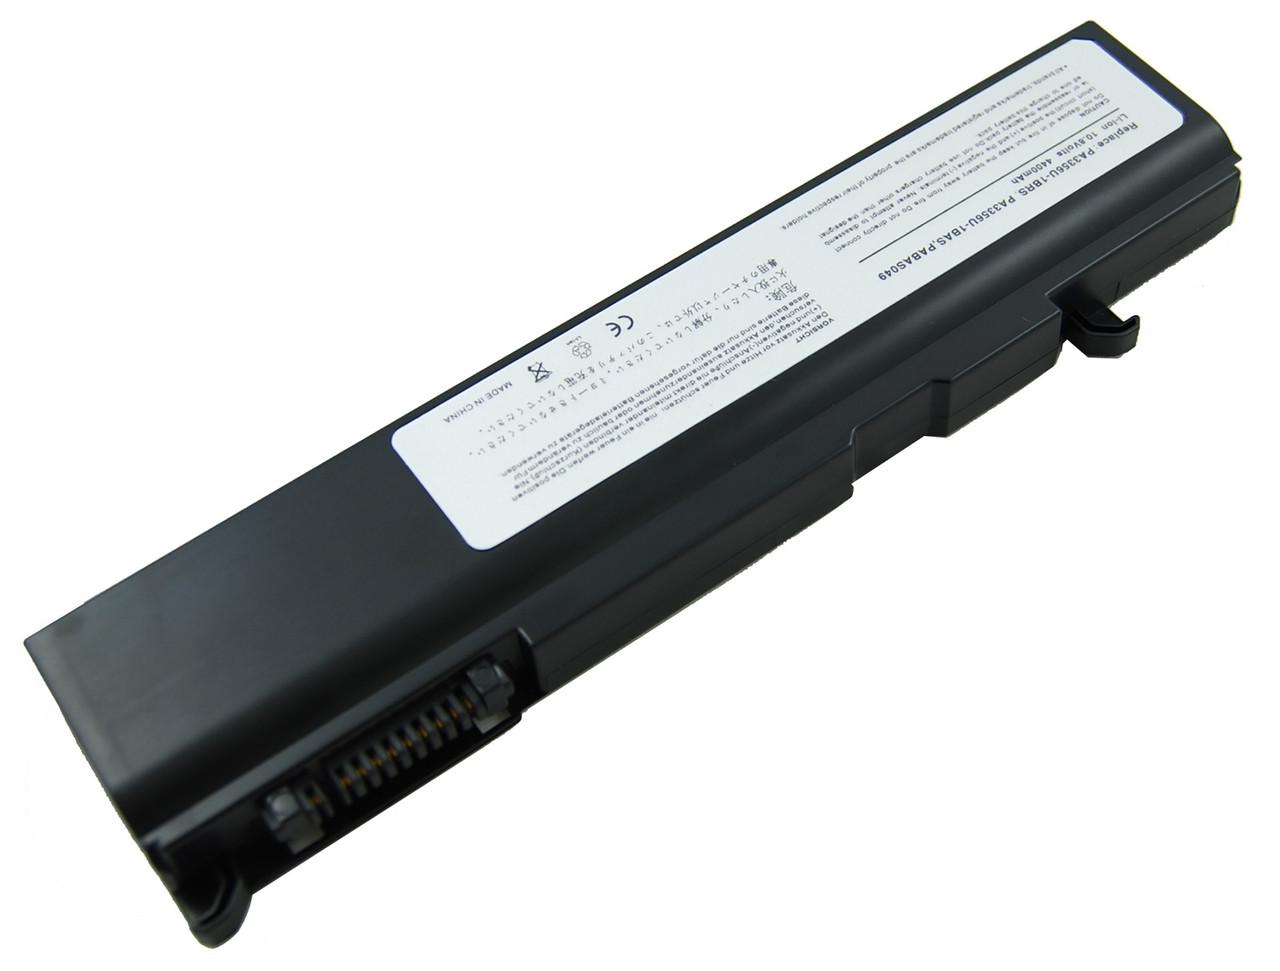 Аккумулятор для ноутбука Toshiba PA3356U-3BRS